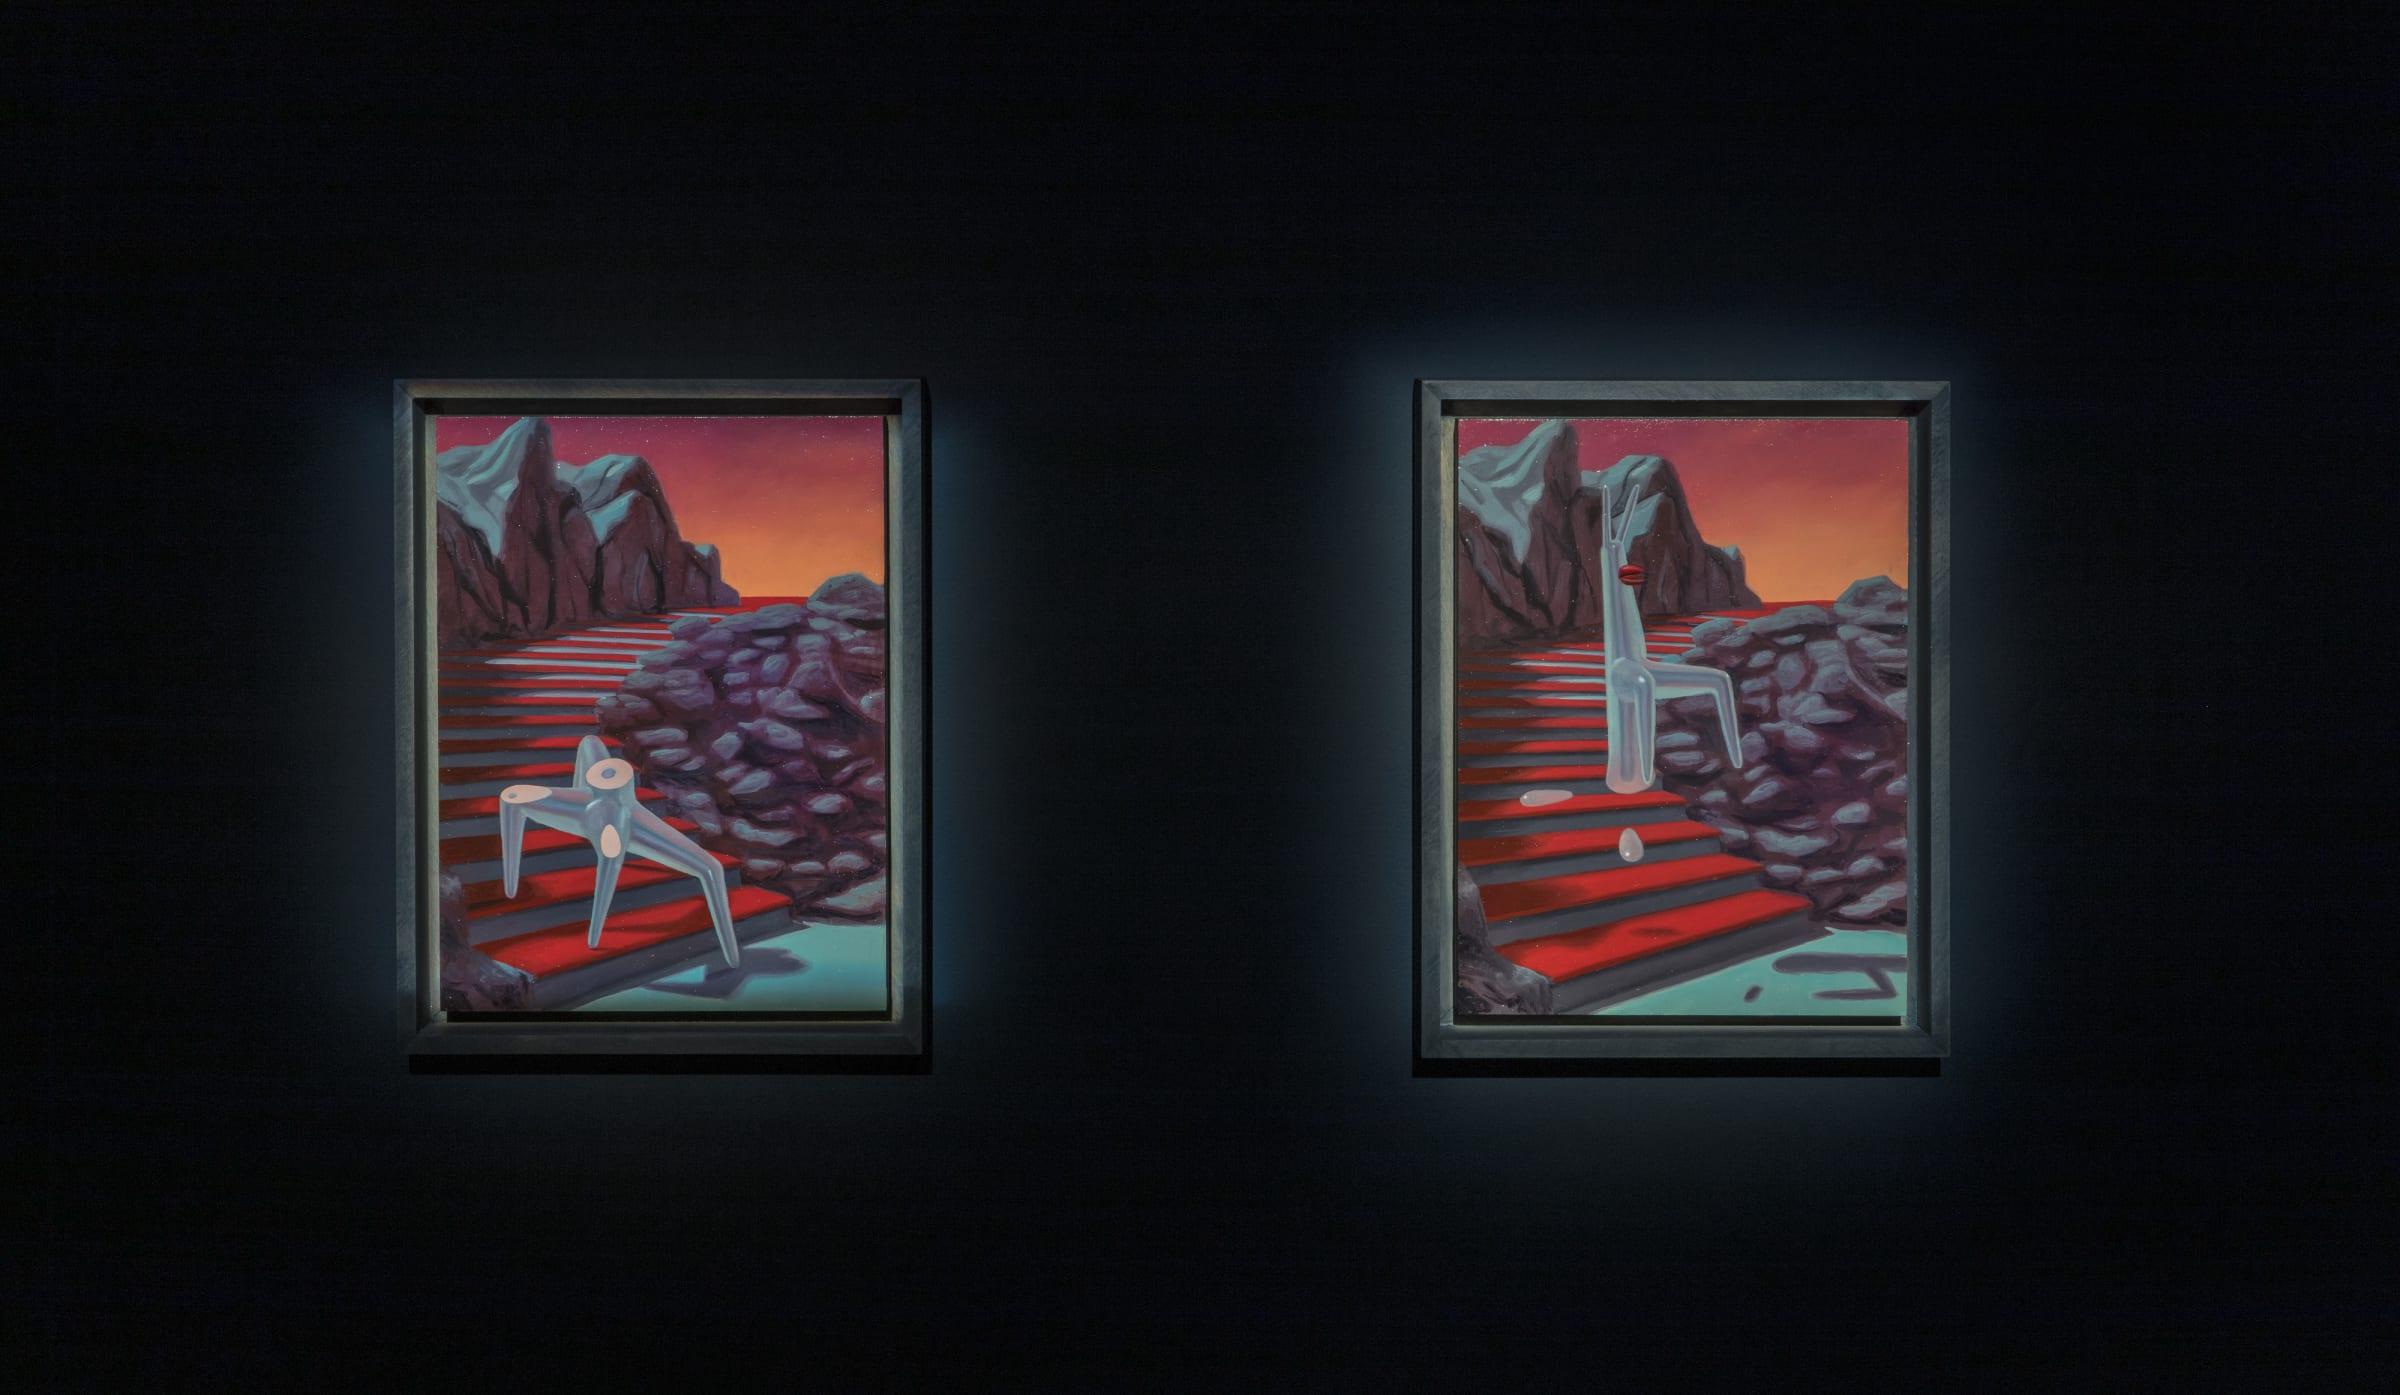 Jeremy Olson, Surrealism, Dadaism and David Lynch